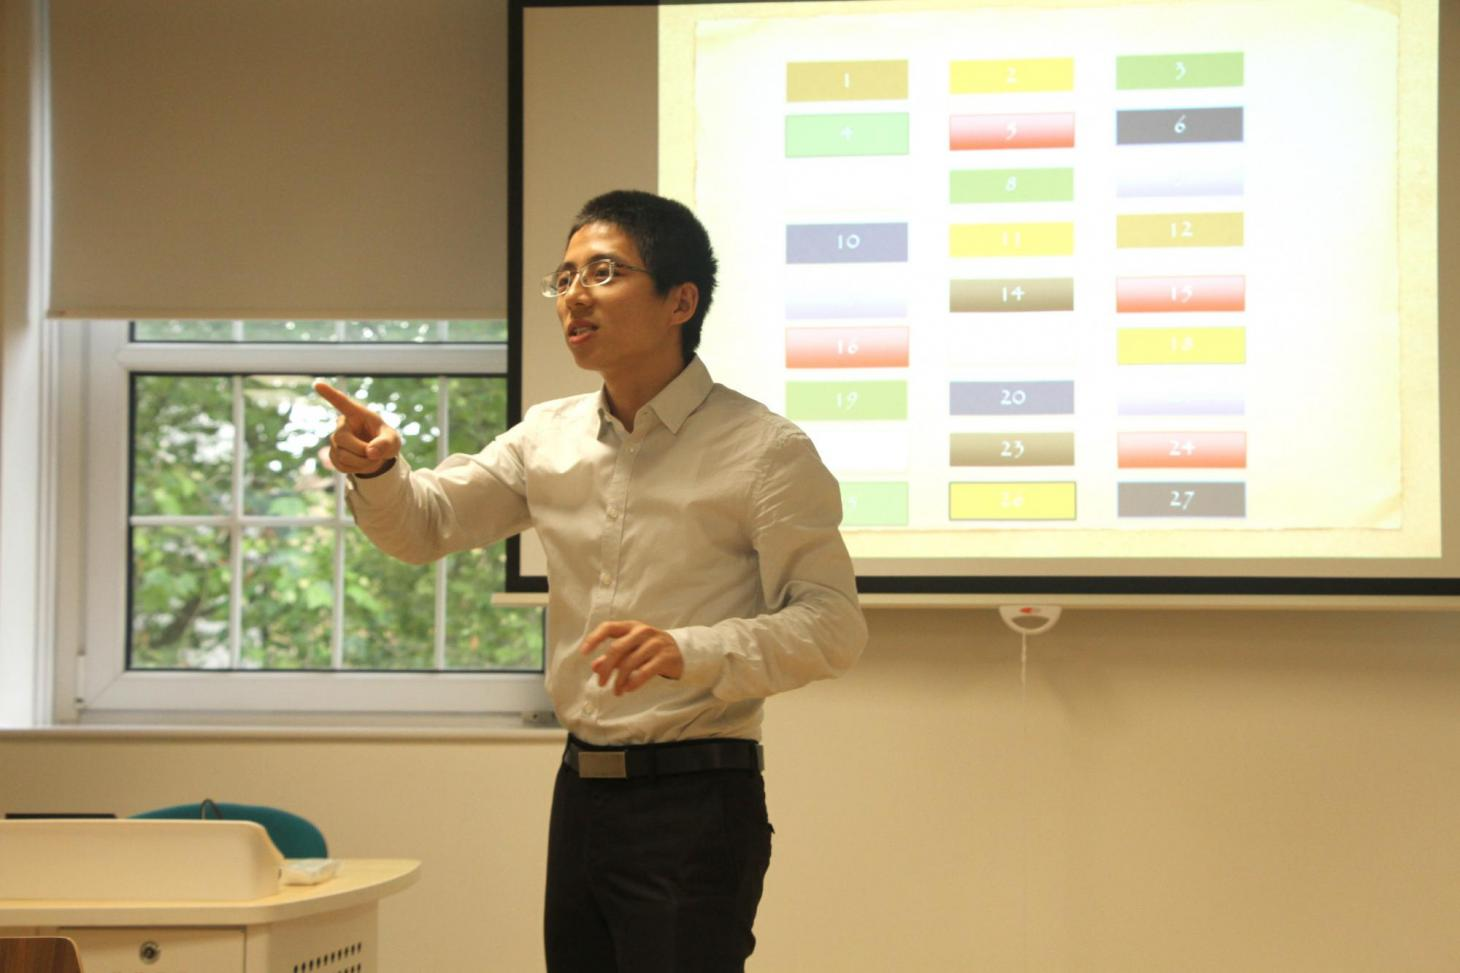 Mr Zhao Jingjie introducing effective classroom activitites